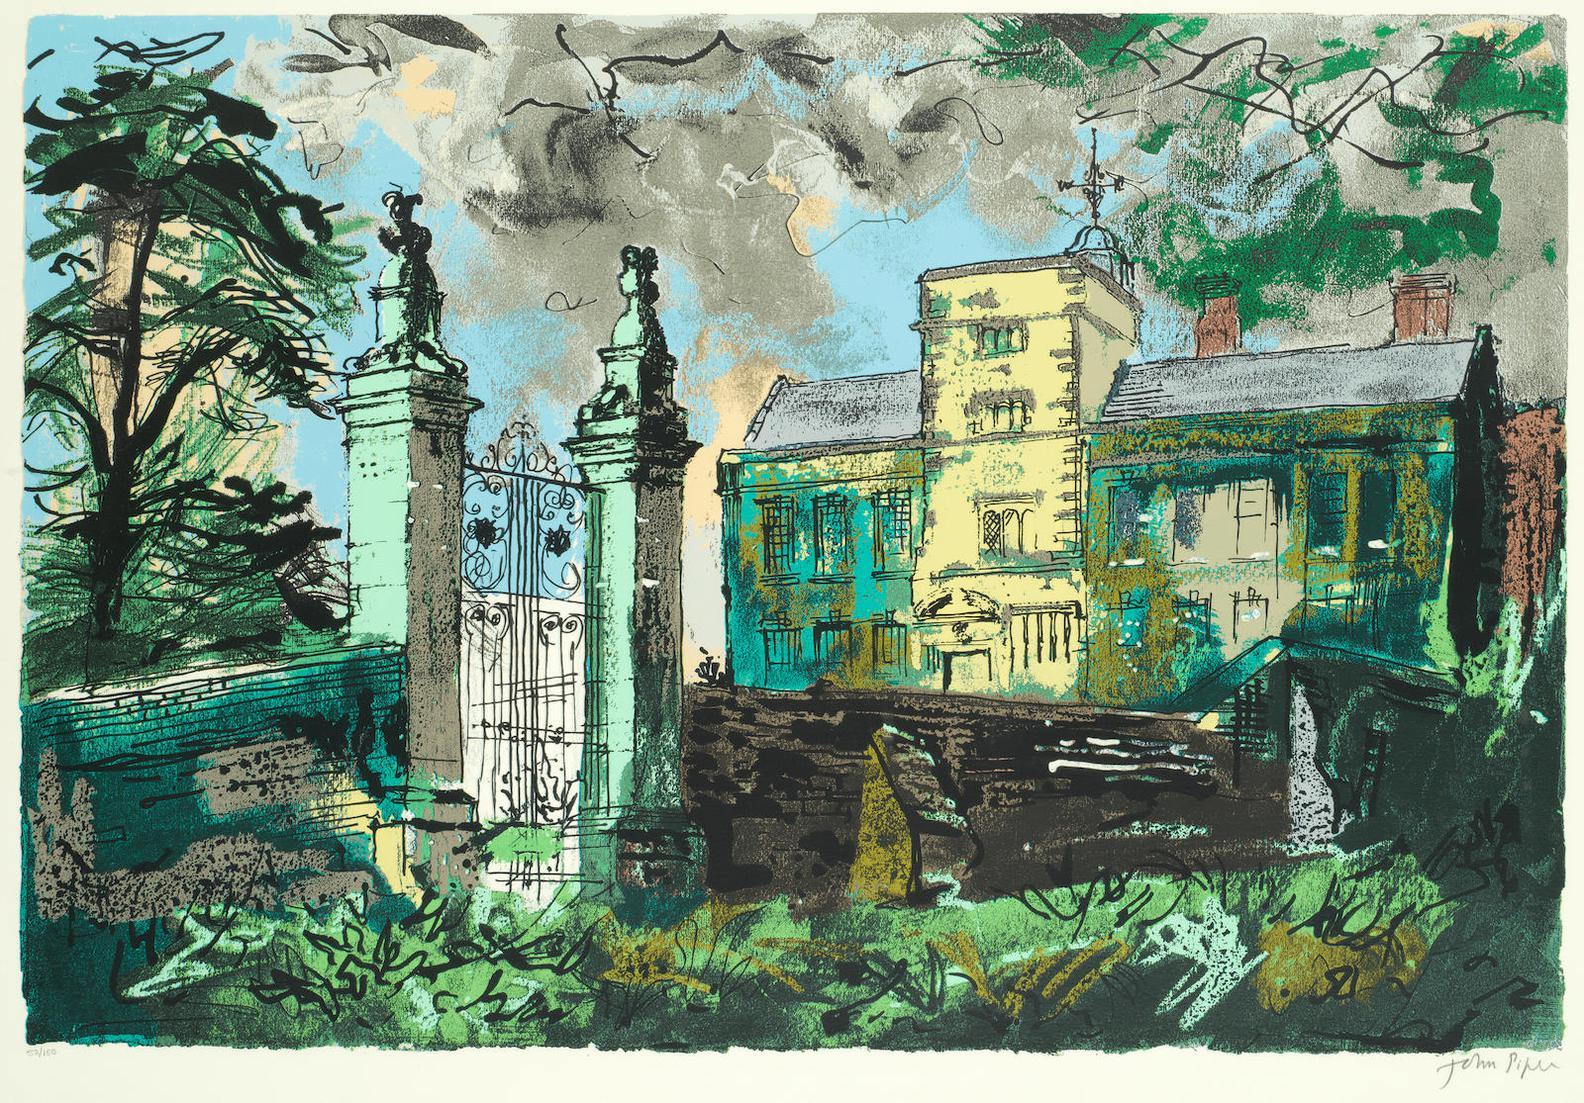 John Piper-Canons Ashby, Northamptonshire (Levinson 350)-1983